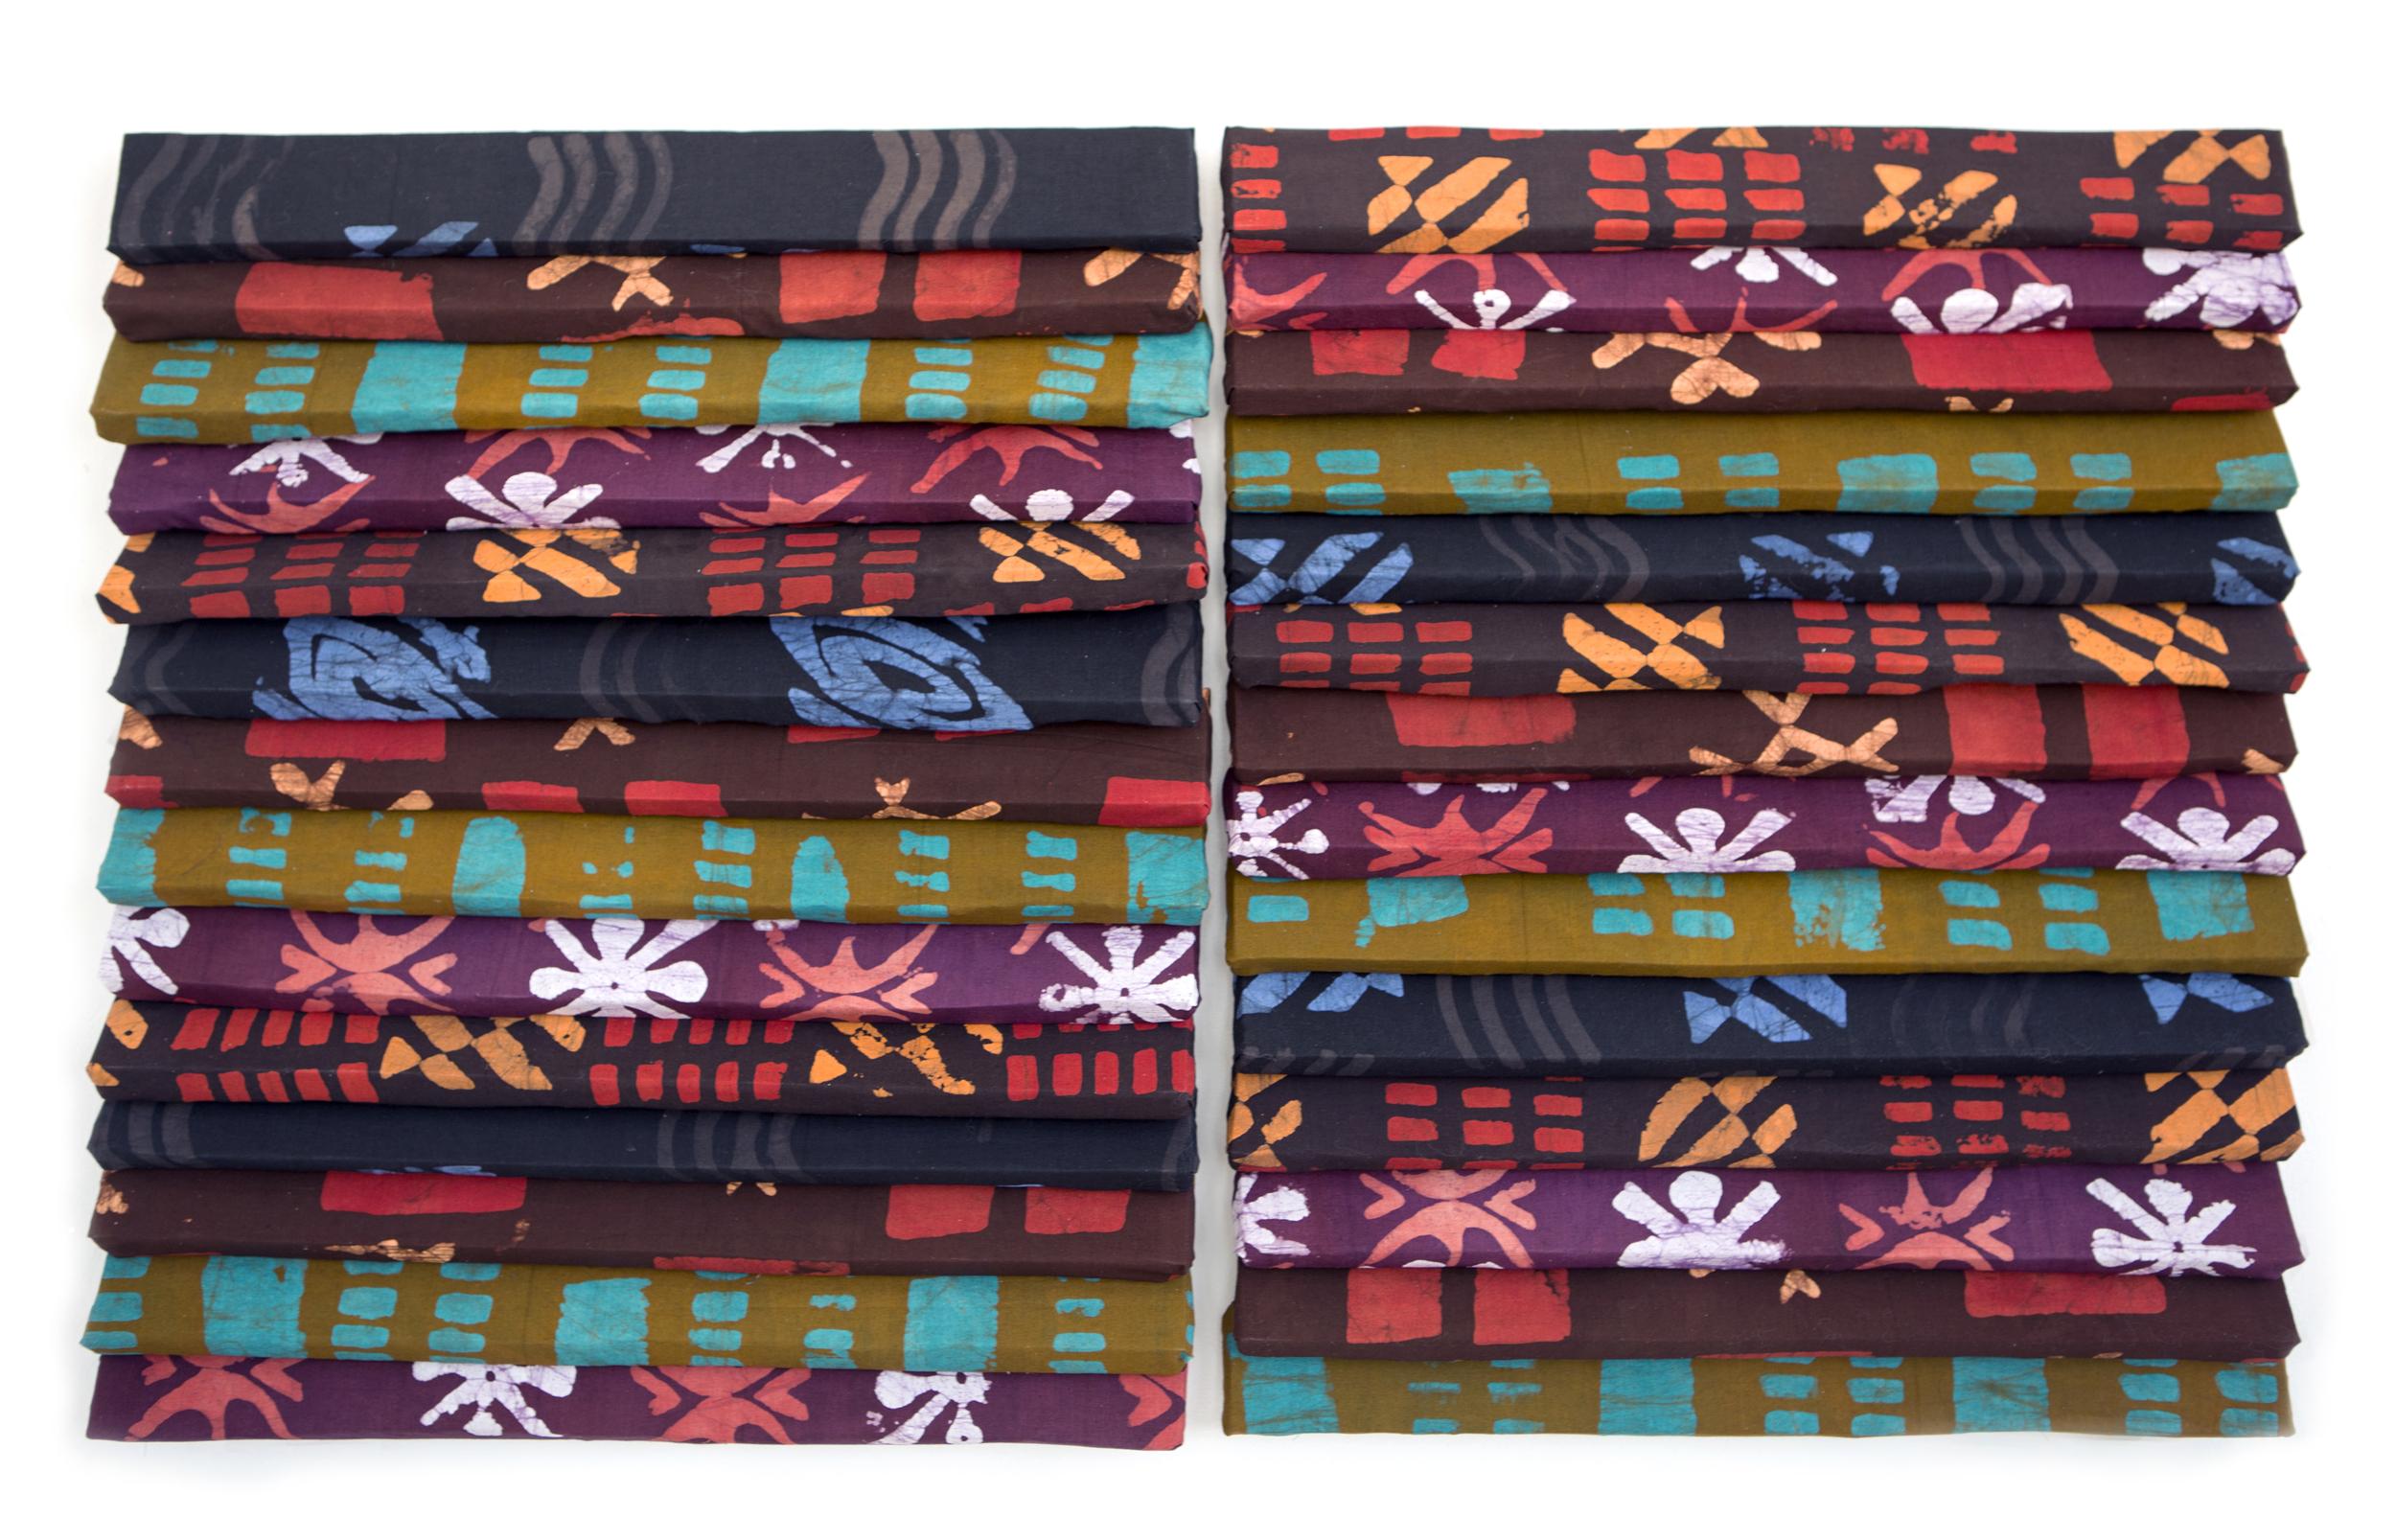 "Again and Again  | batik prints on cotton, foam | 51"" x 30"" x 3"" | 2016"